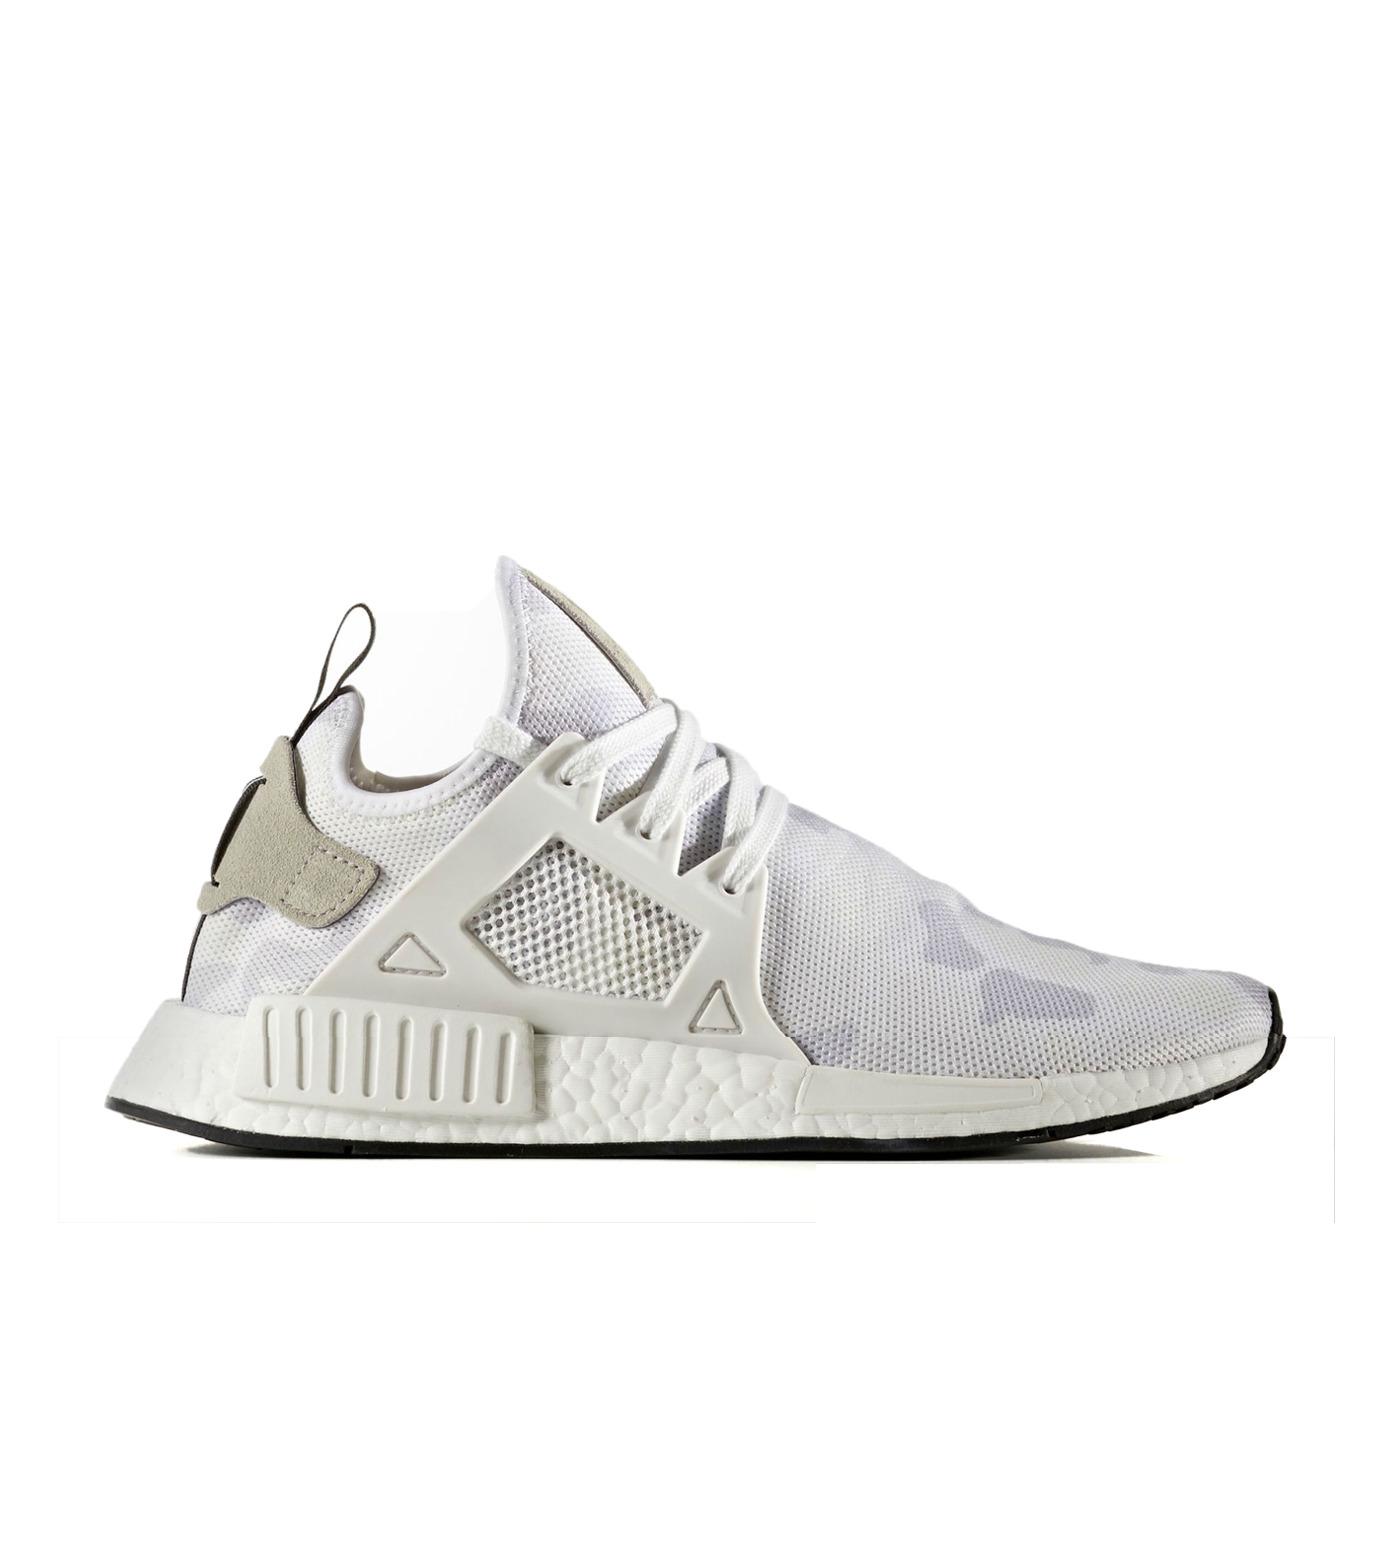 adidas(アディダス)のNMD XR1-WHITE(シューズ/shoes)-BA7233-4 拡大詳細画像1